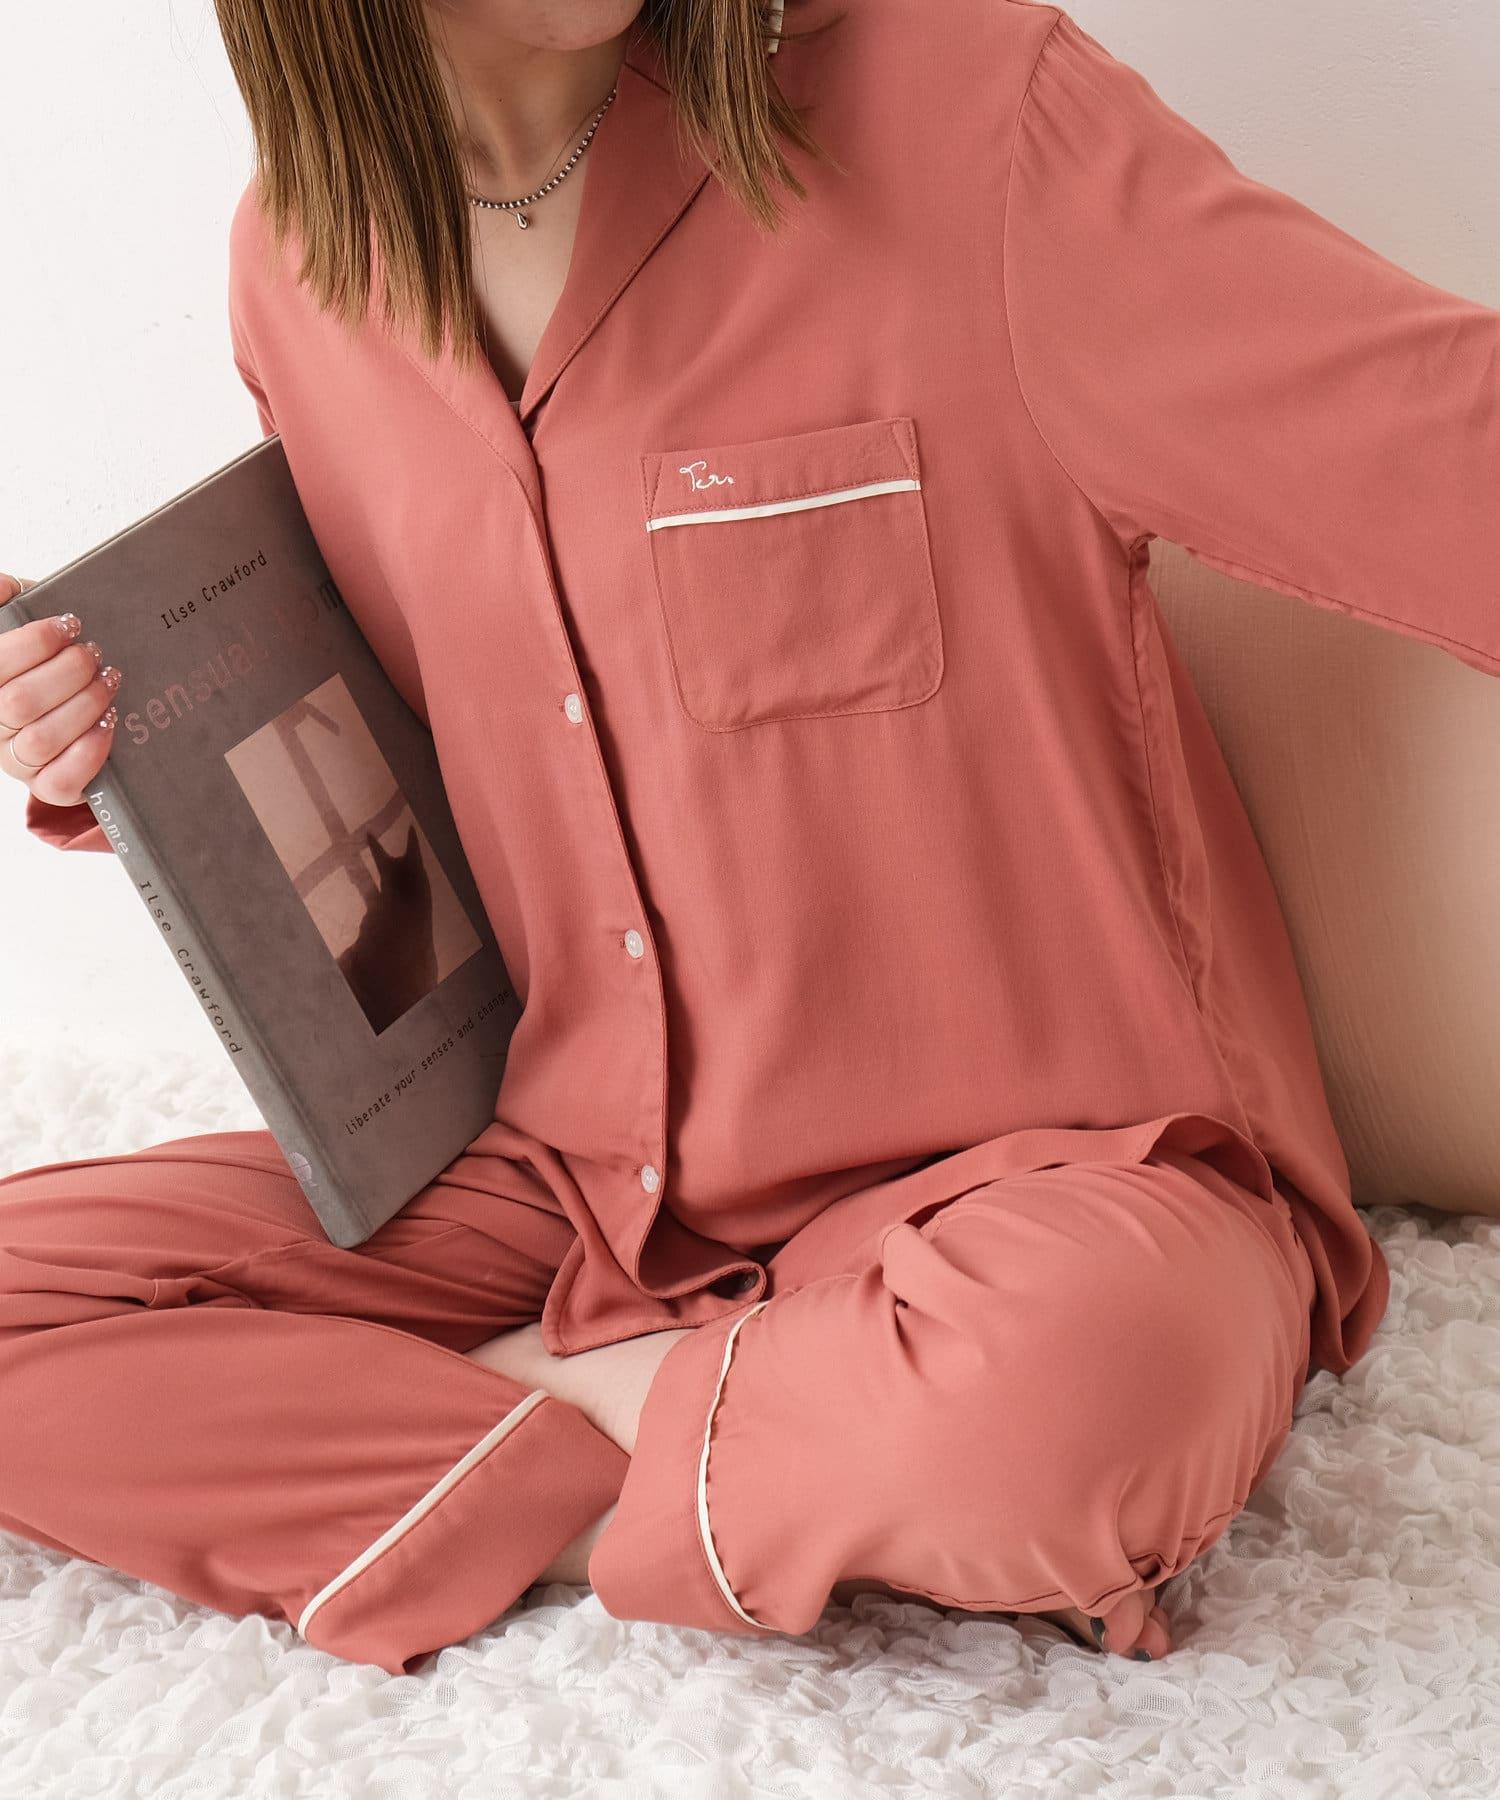 TERRITOIRE(テリトワール) 【しあわせな眠りを】LADIES 快眠リラックスパジャマ 上下セット